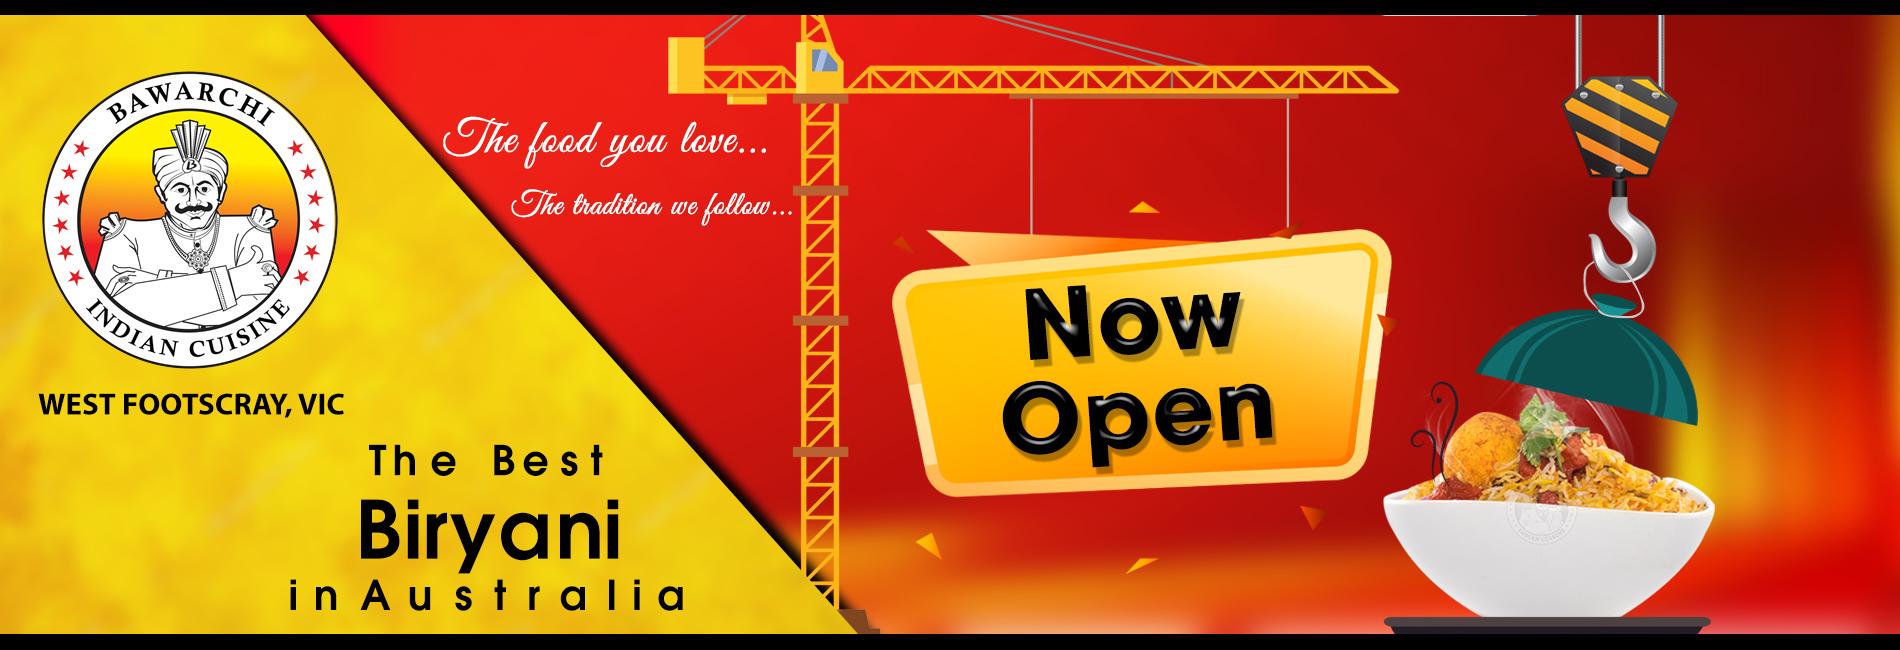 Bawarchi Melbourne - Now Open